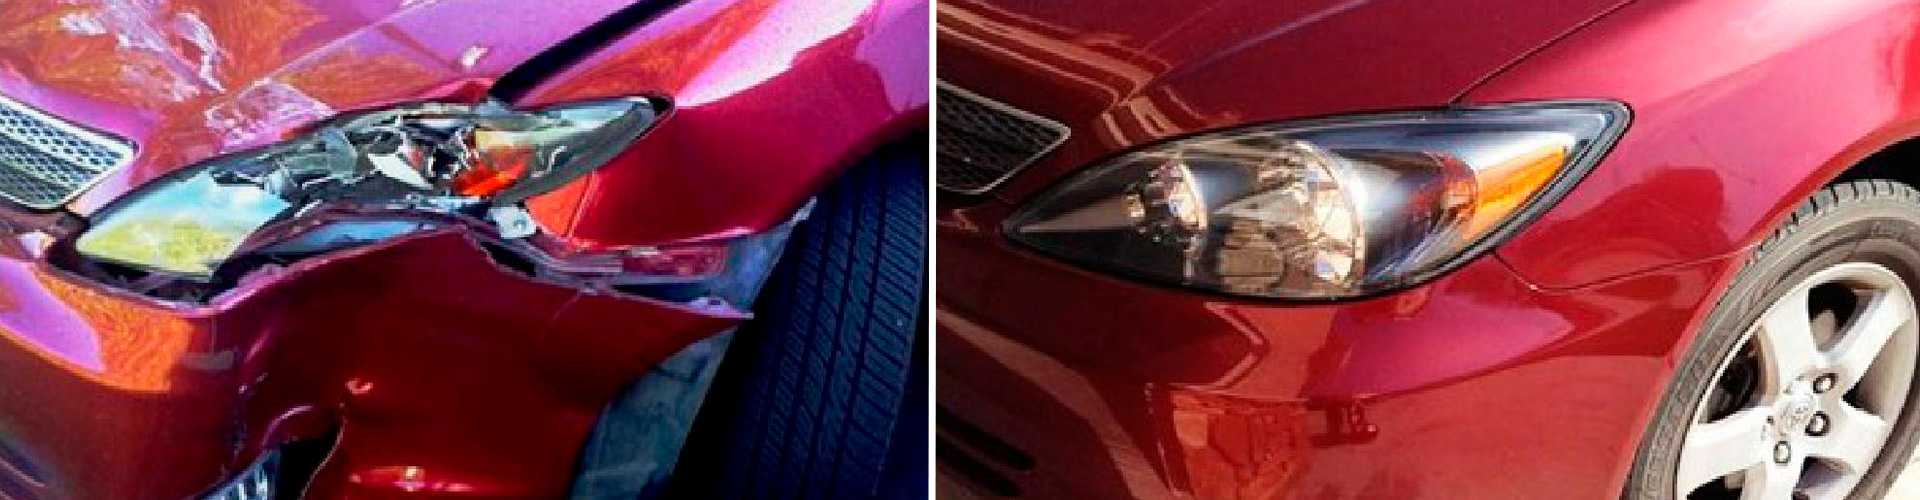 Авто до и после ремонта кузова